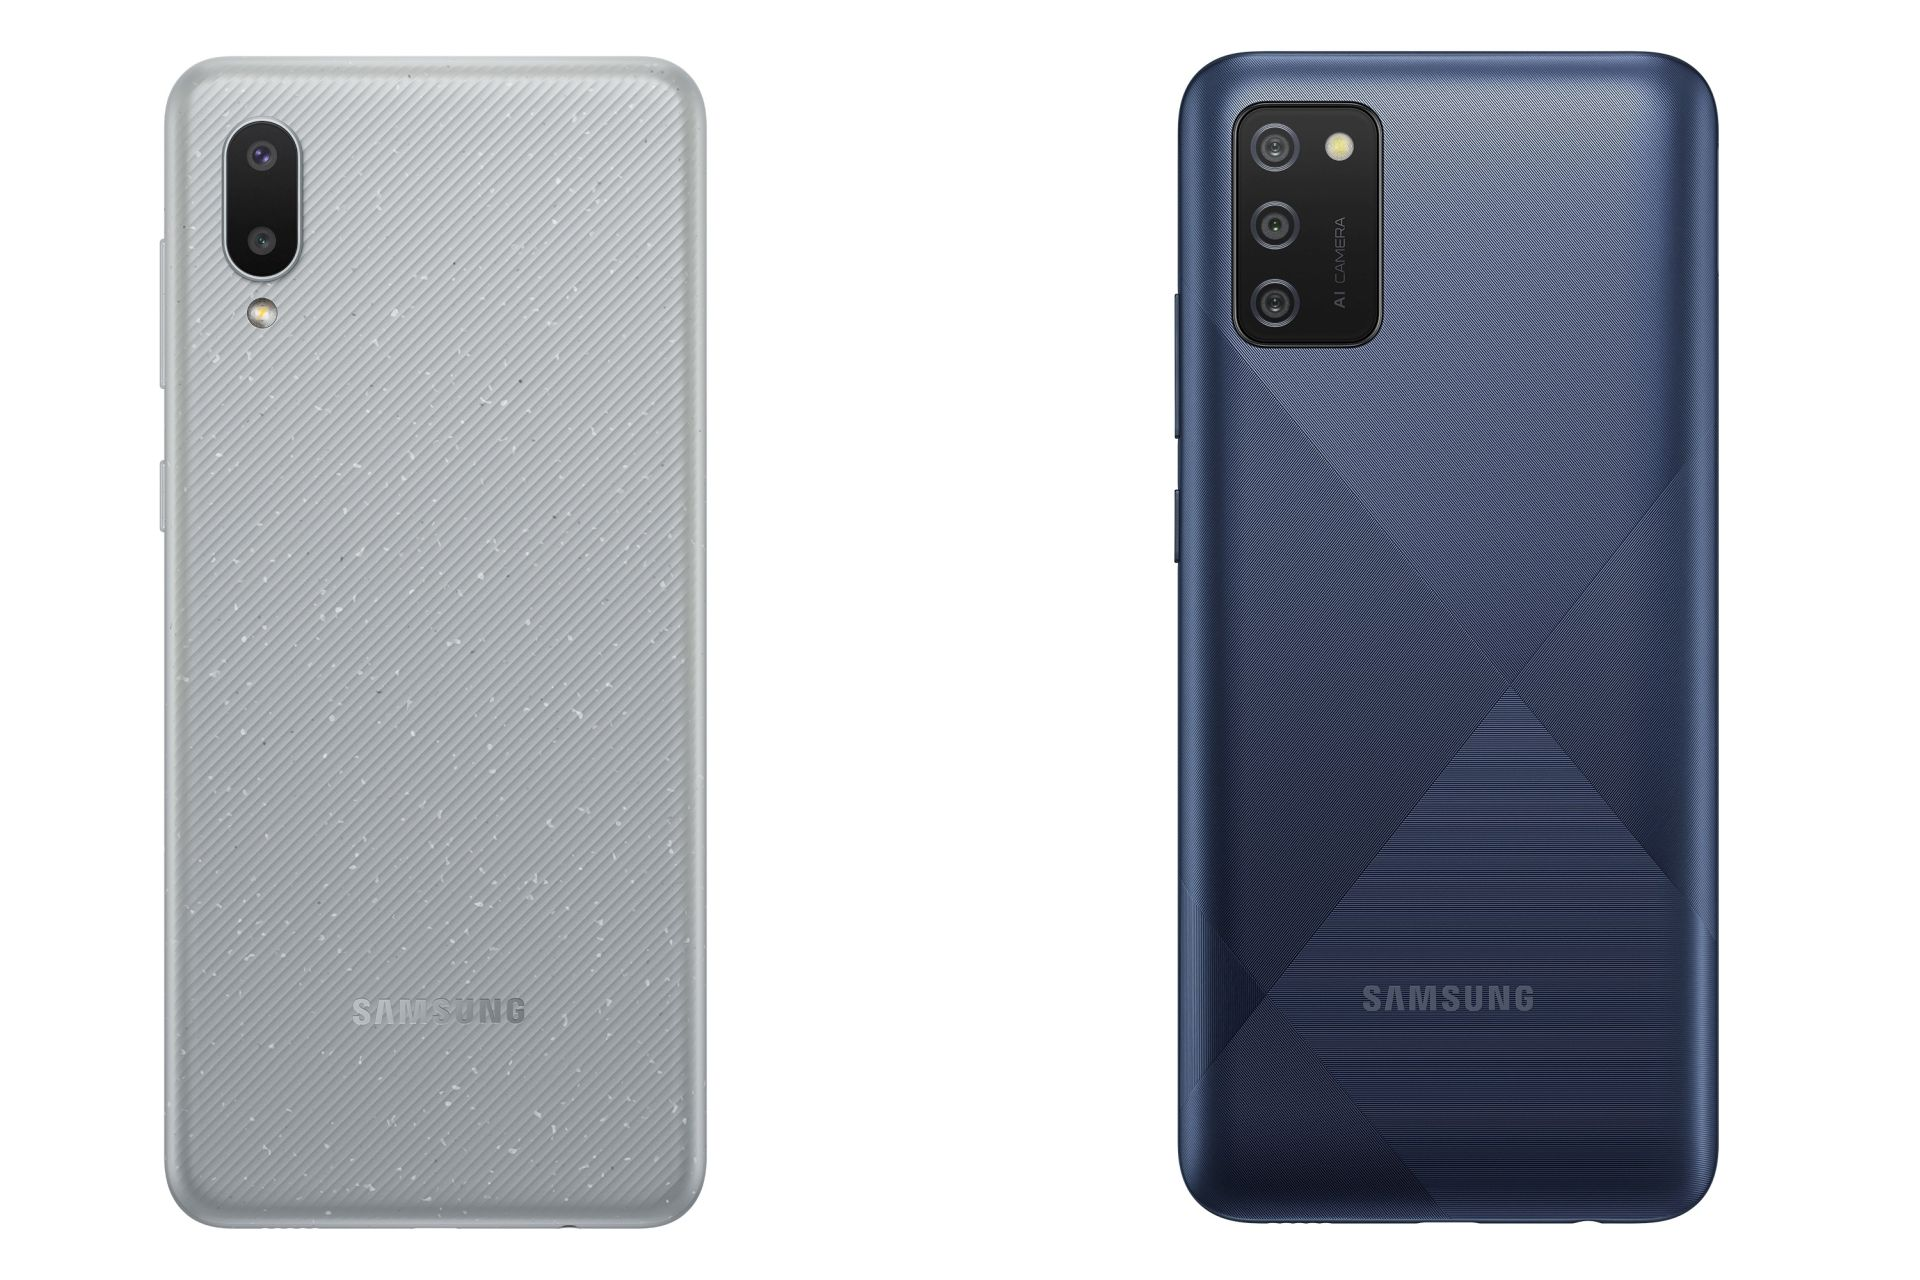 Galaxy A02 vs A02s